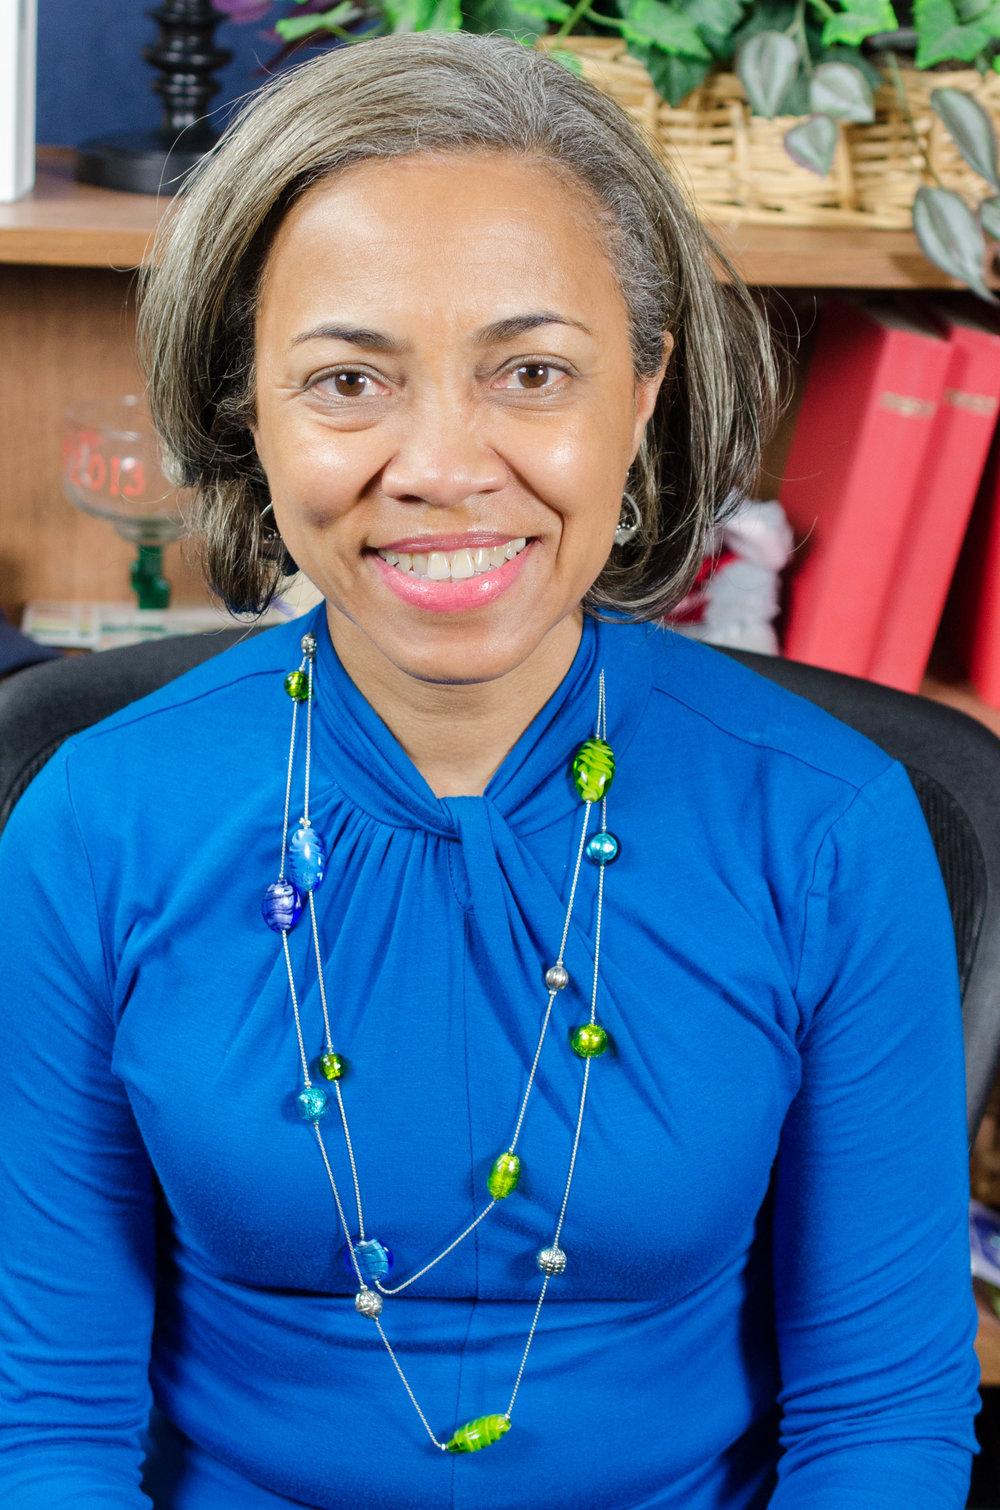 Rev. Gina Jacobs-Strain